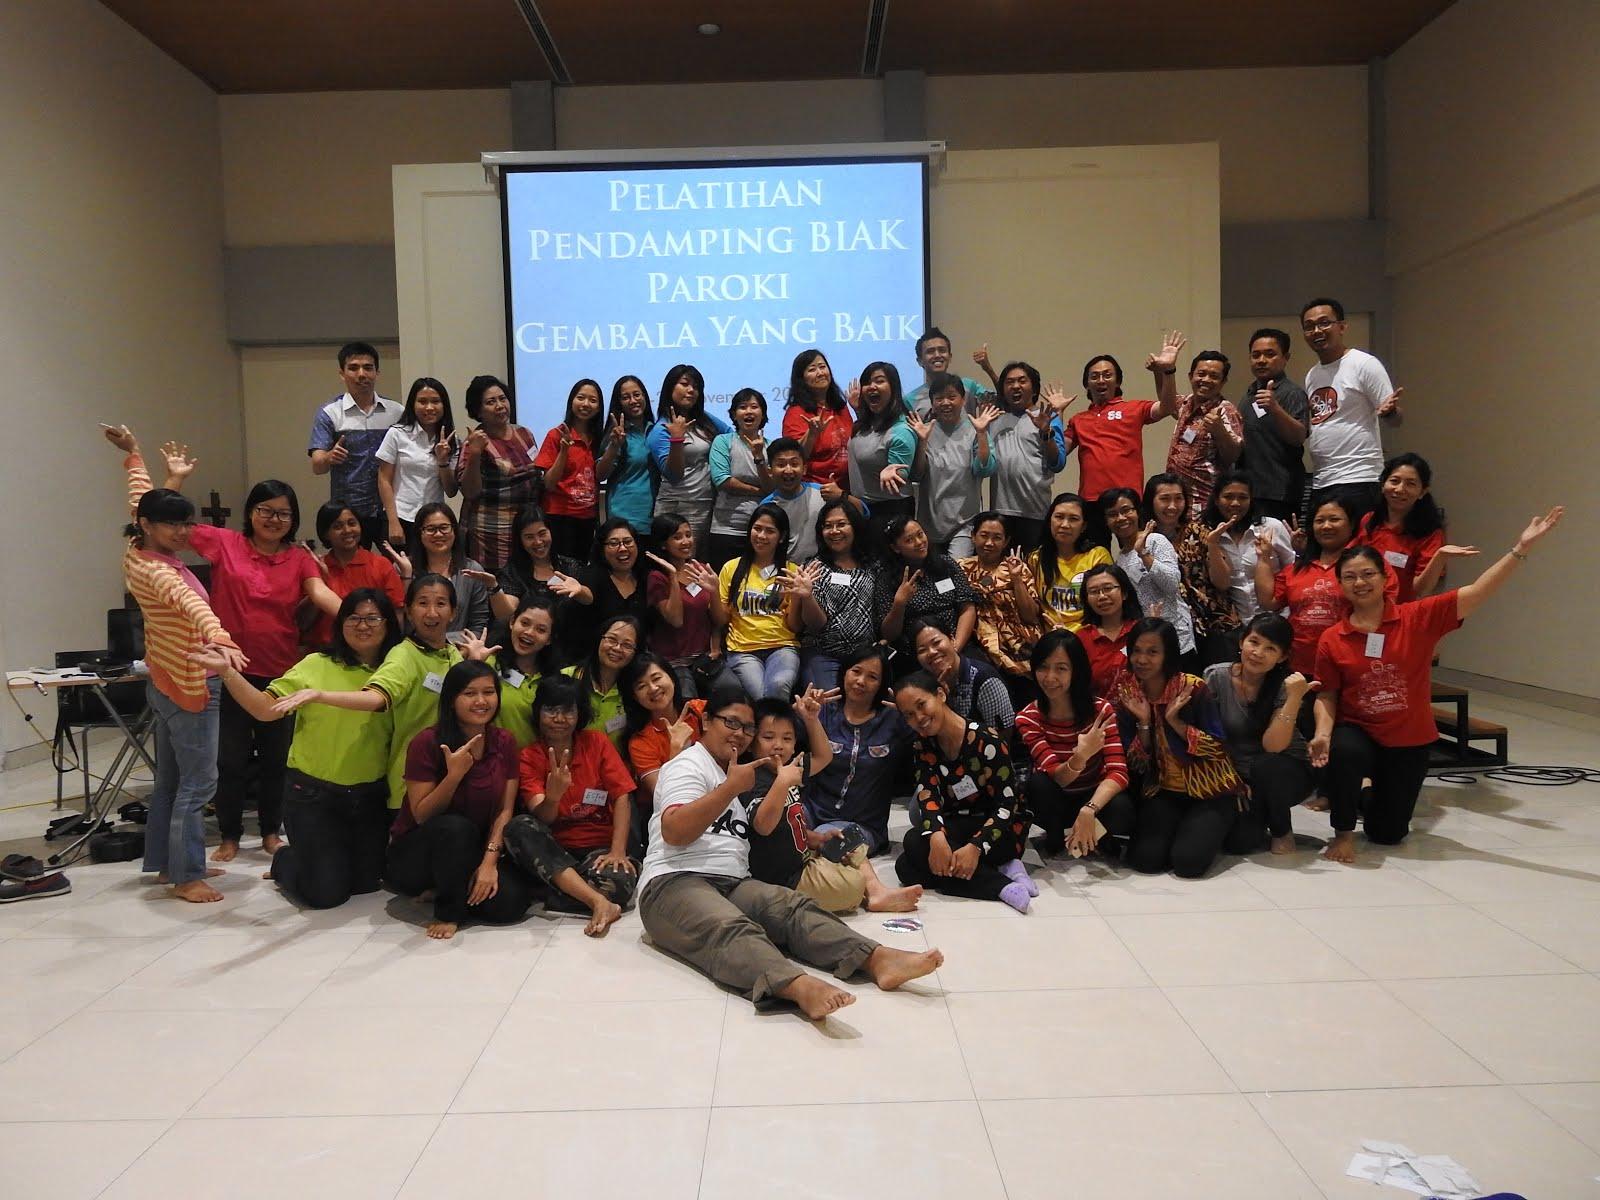 Bersama pendamping BIAK paroki Gembala Yang Baik Surabaya (26-27 November 2016)